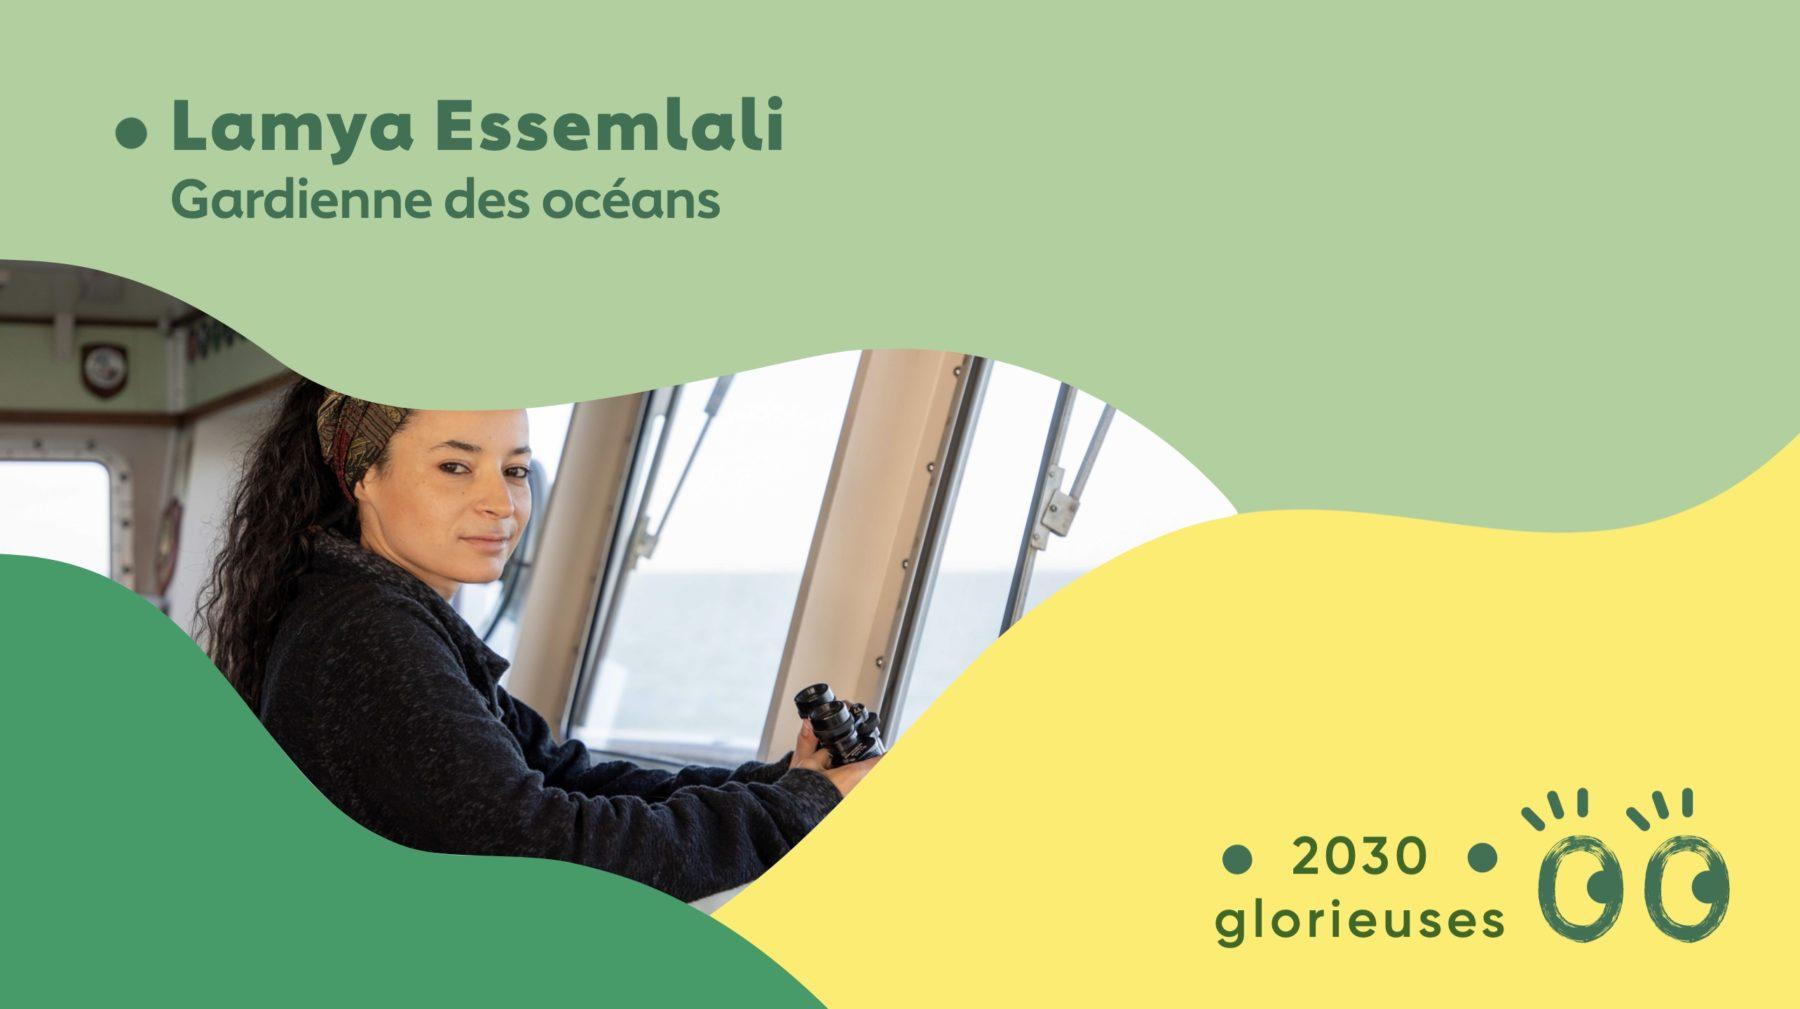 2030 Glorieuses #43 : Lamya Essemlali